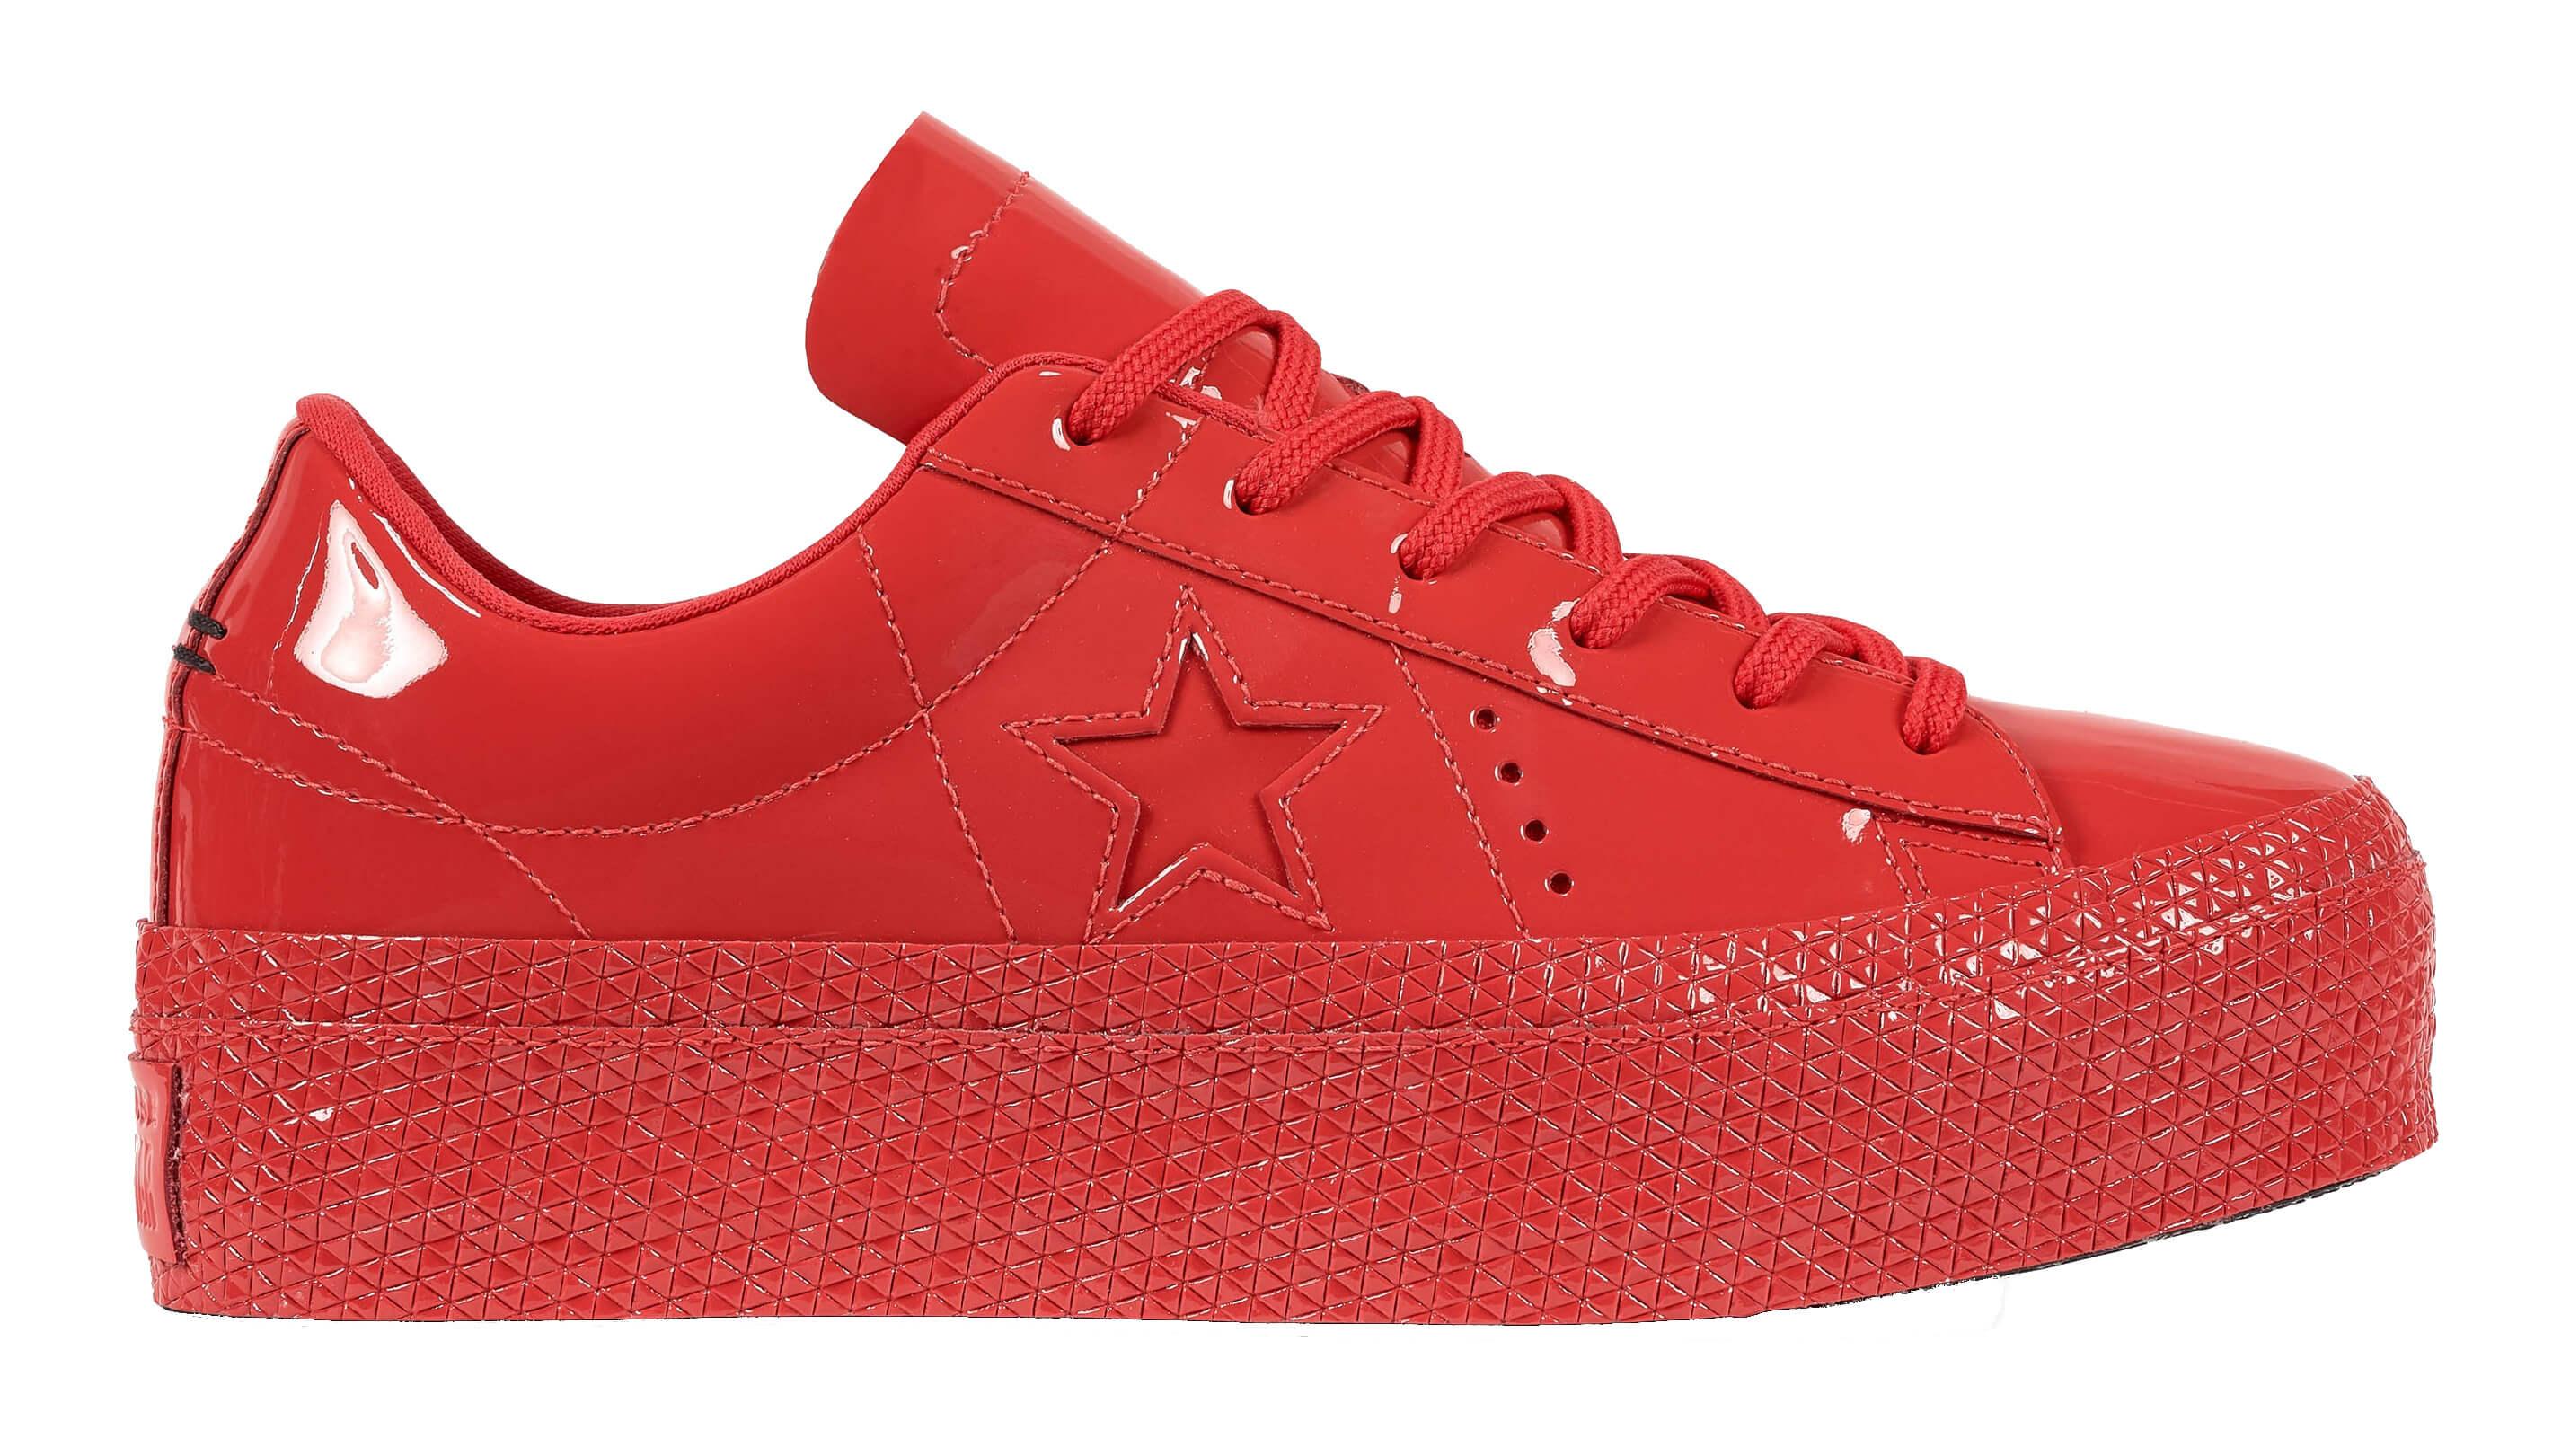 737ecbc3ea4 Converse Dámské tenisky One Star Platform Cherry Red Cherry Red Black